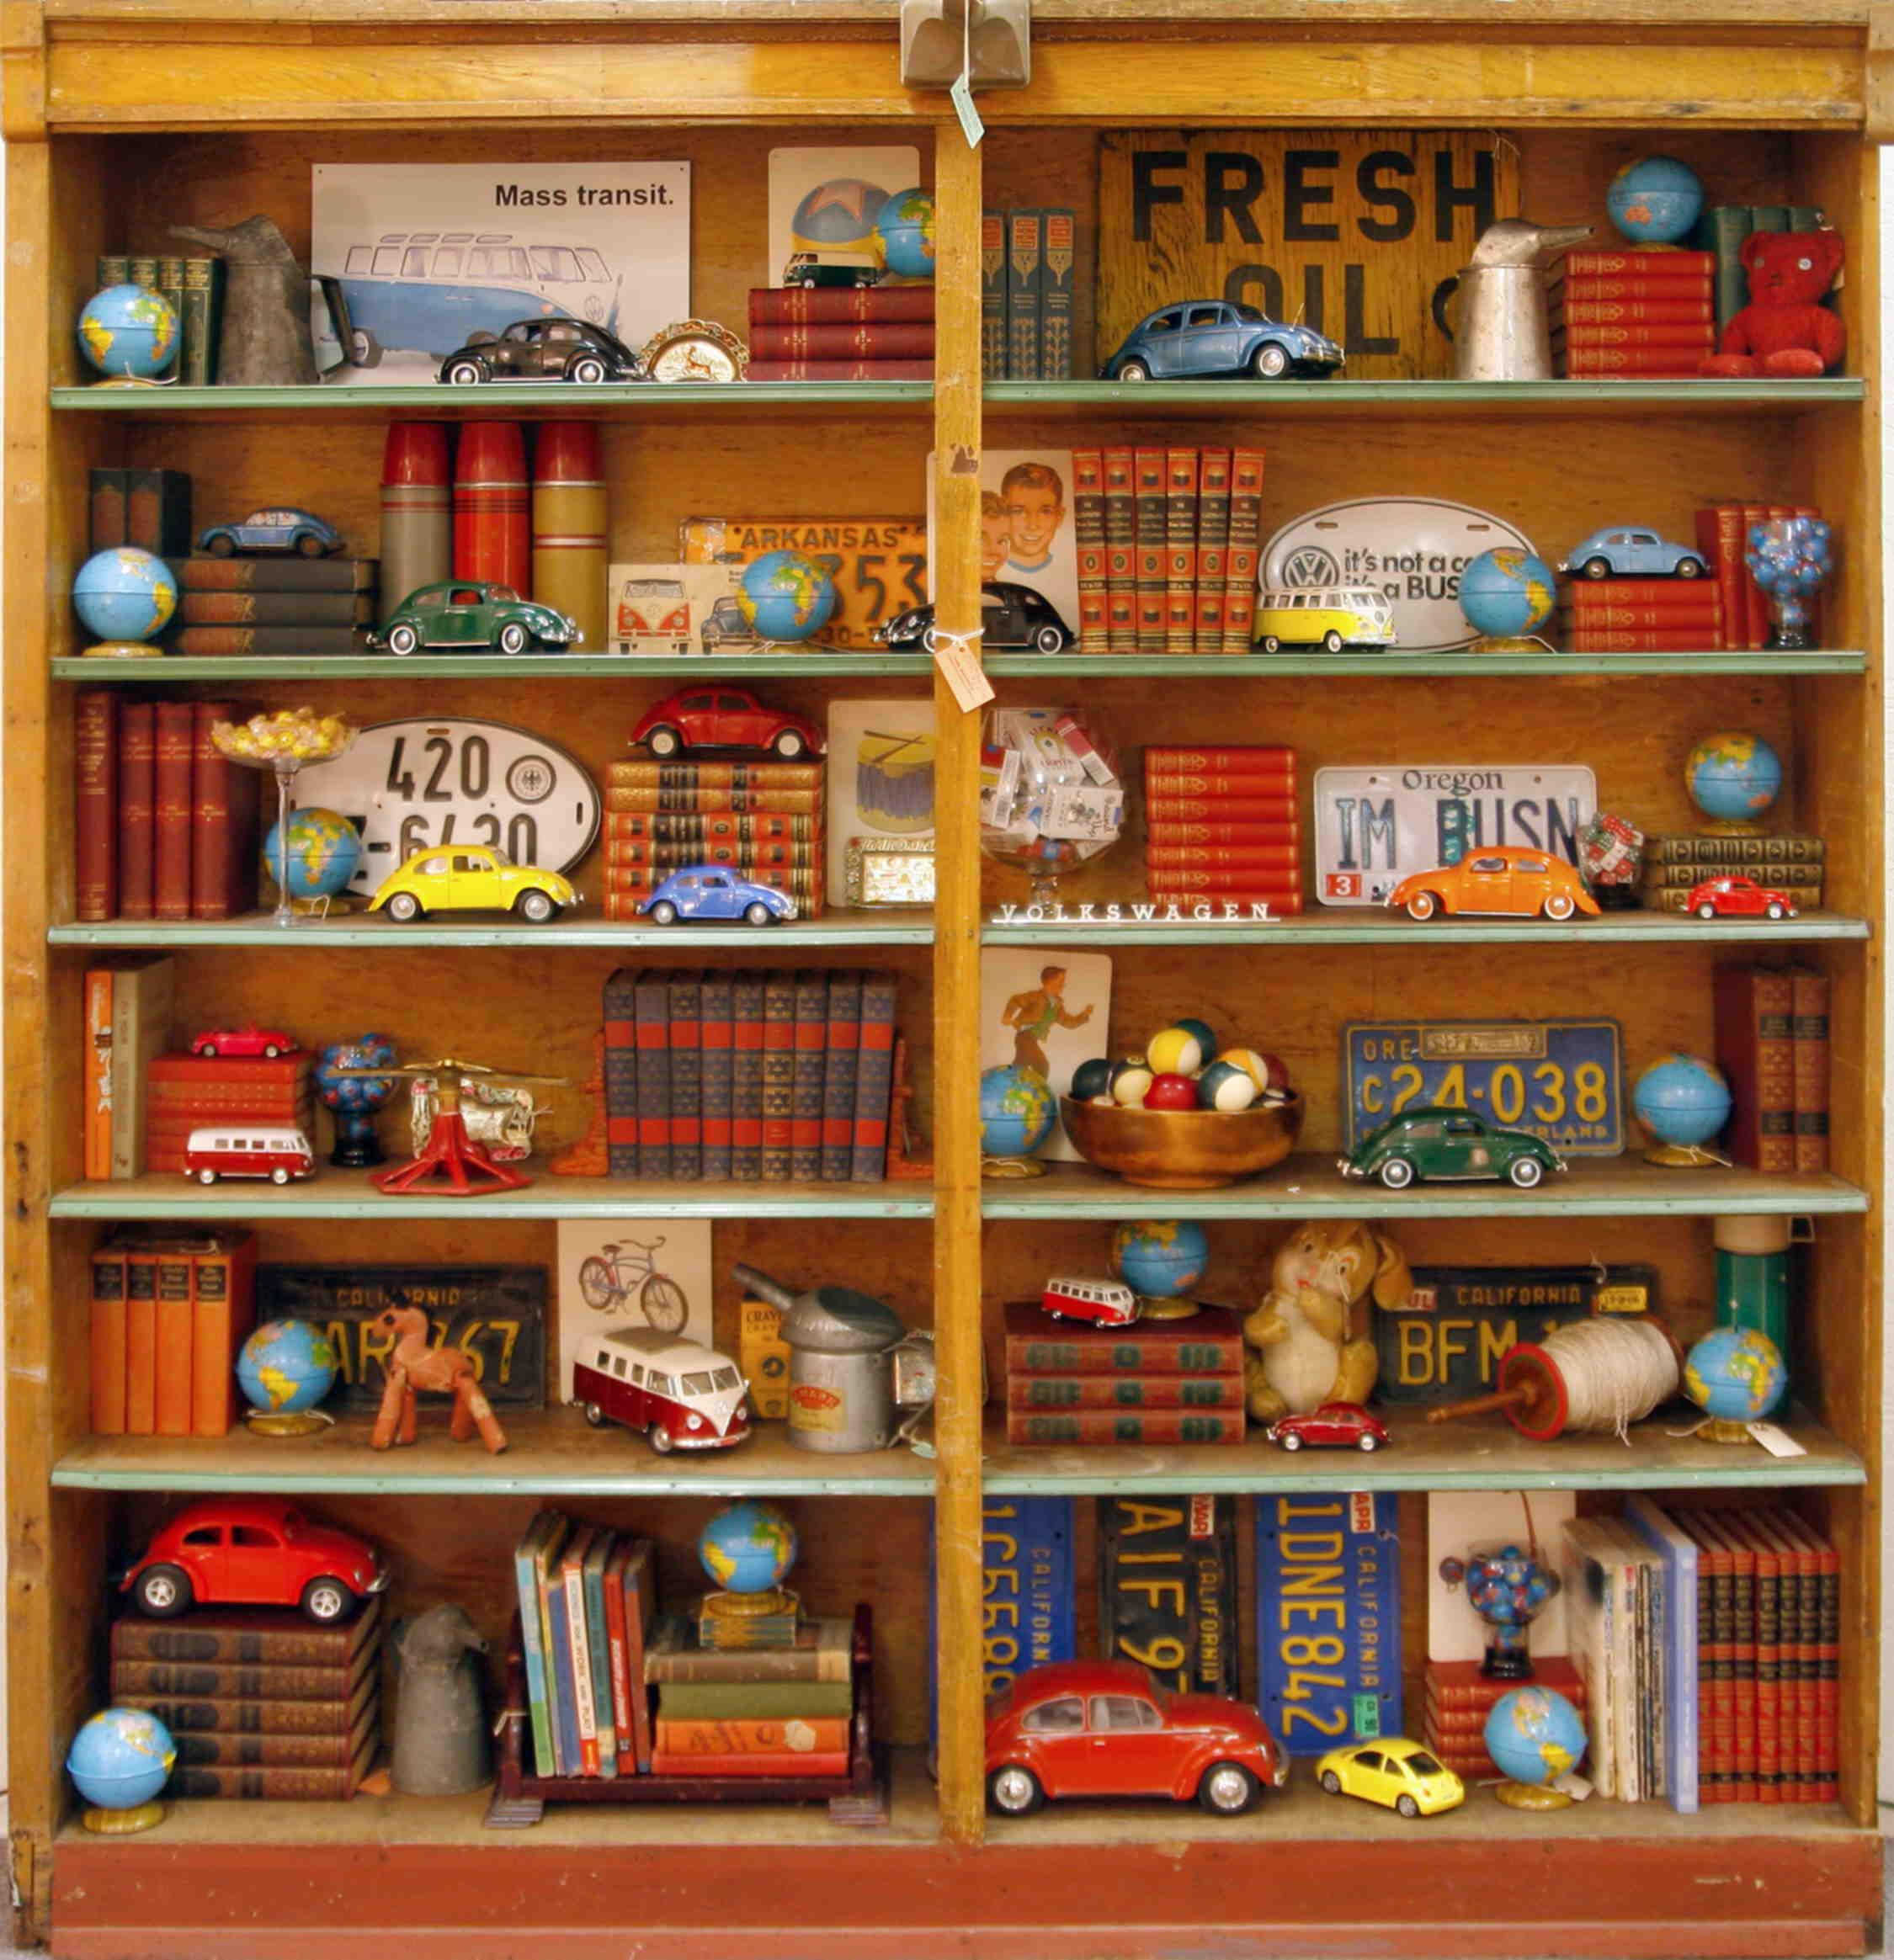 Household Goods Store: Retail Store & Visual Merchandising By